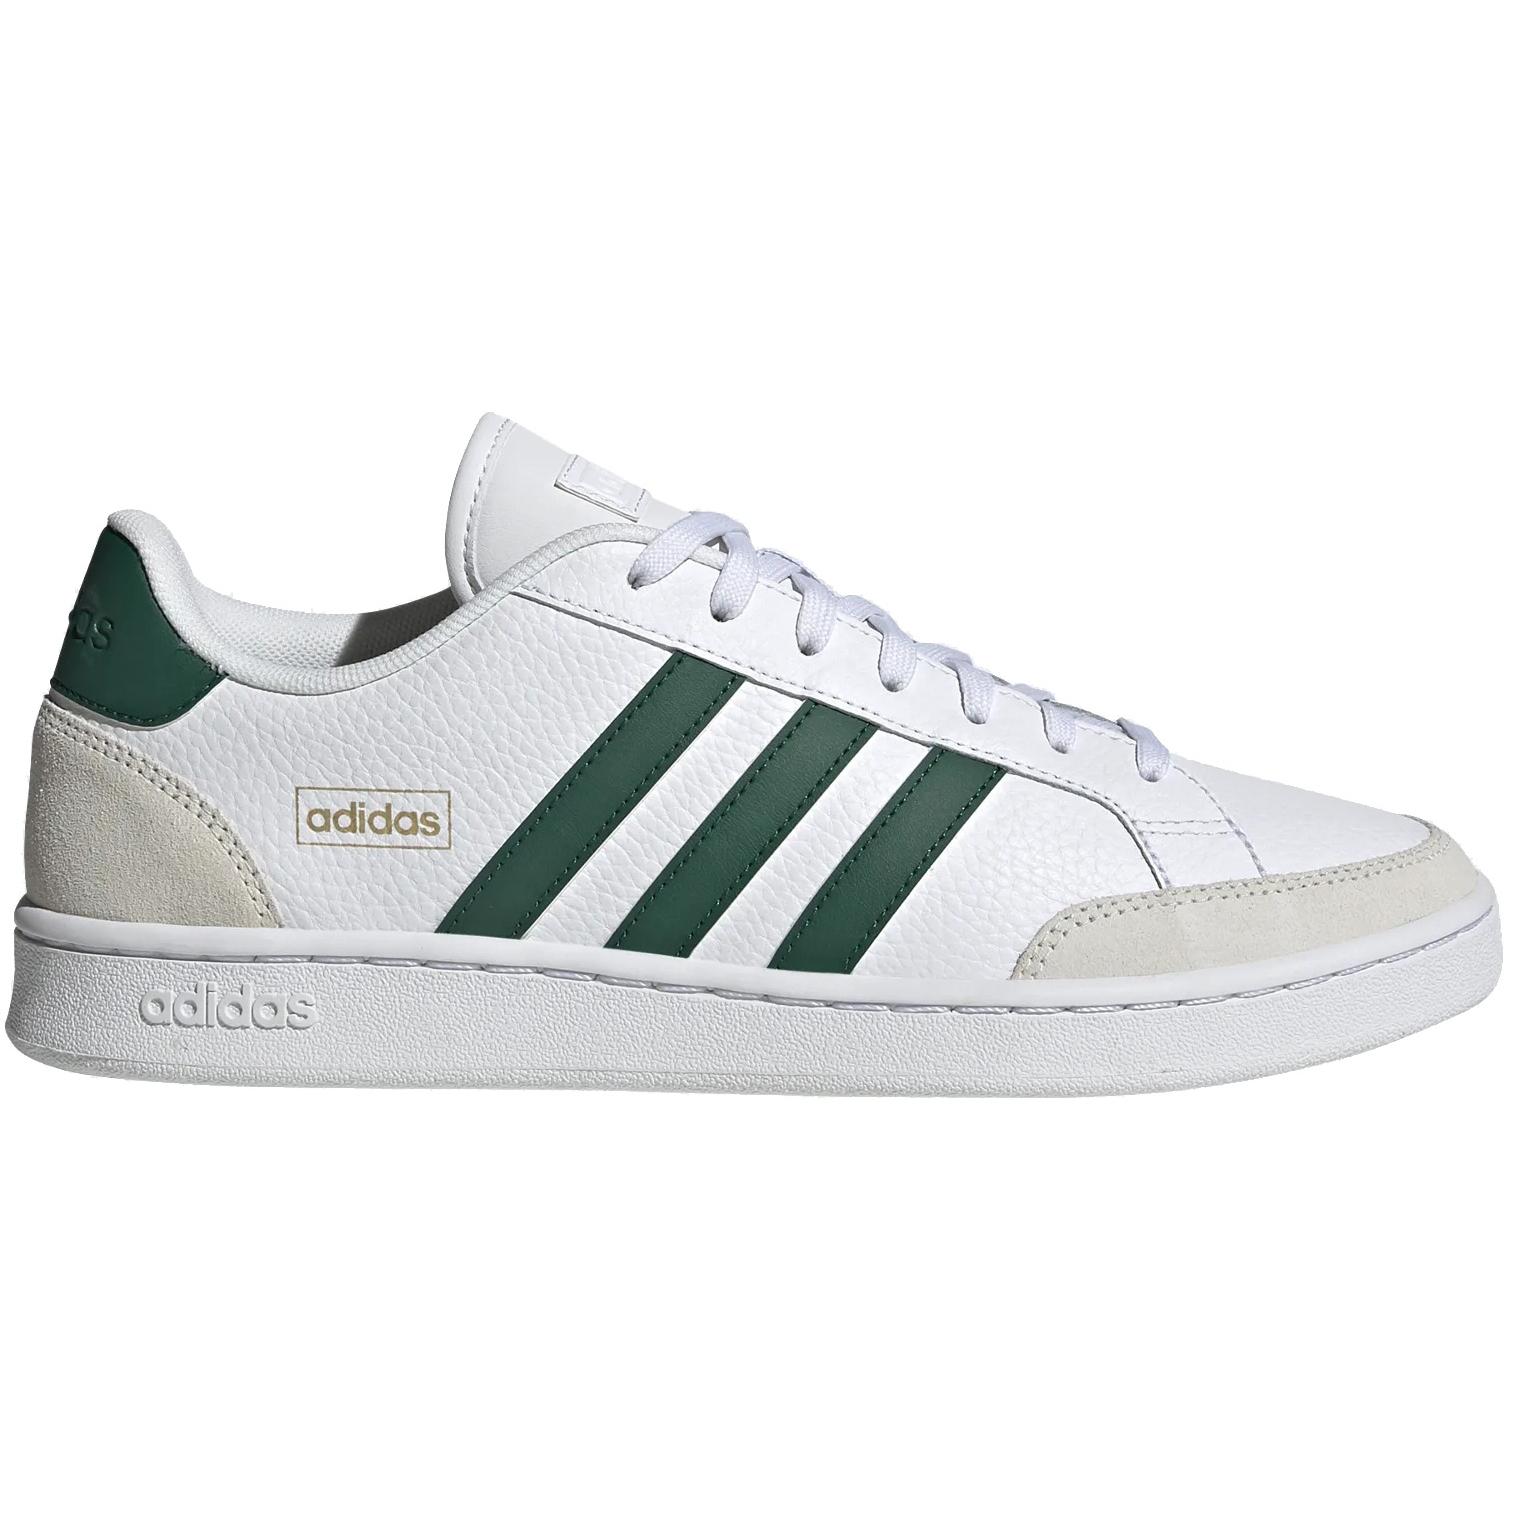 adidas Grand Court SE Shoes - cloud white/collegiate green/orbit grey FW6688